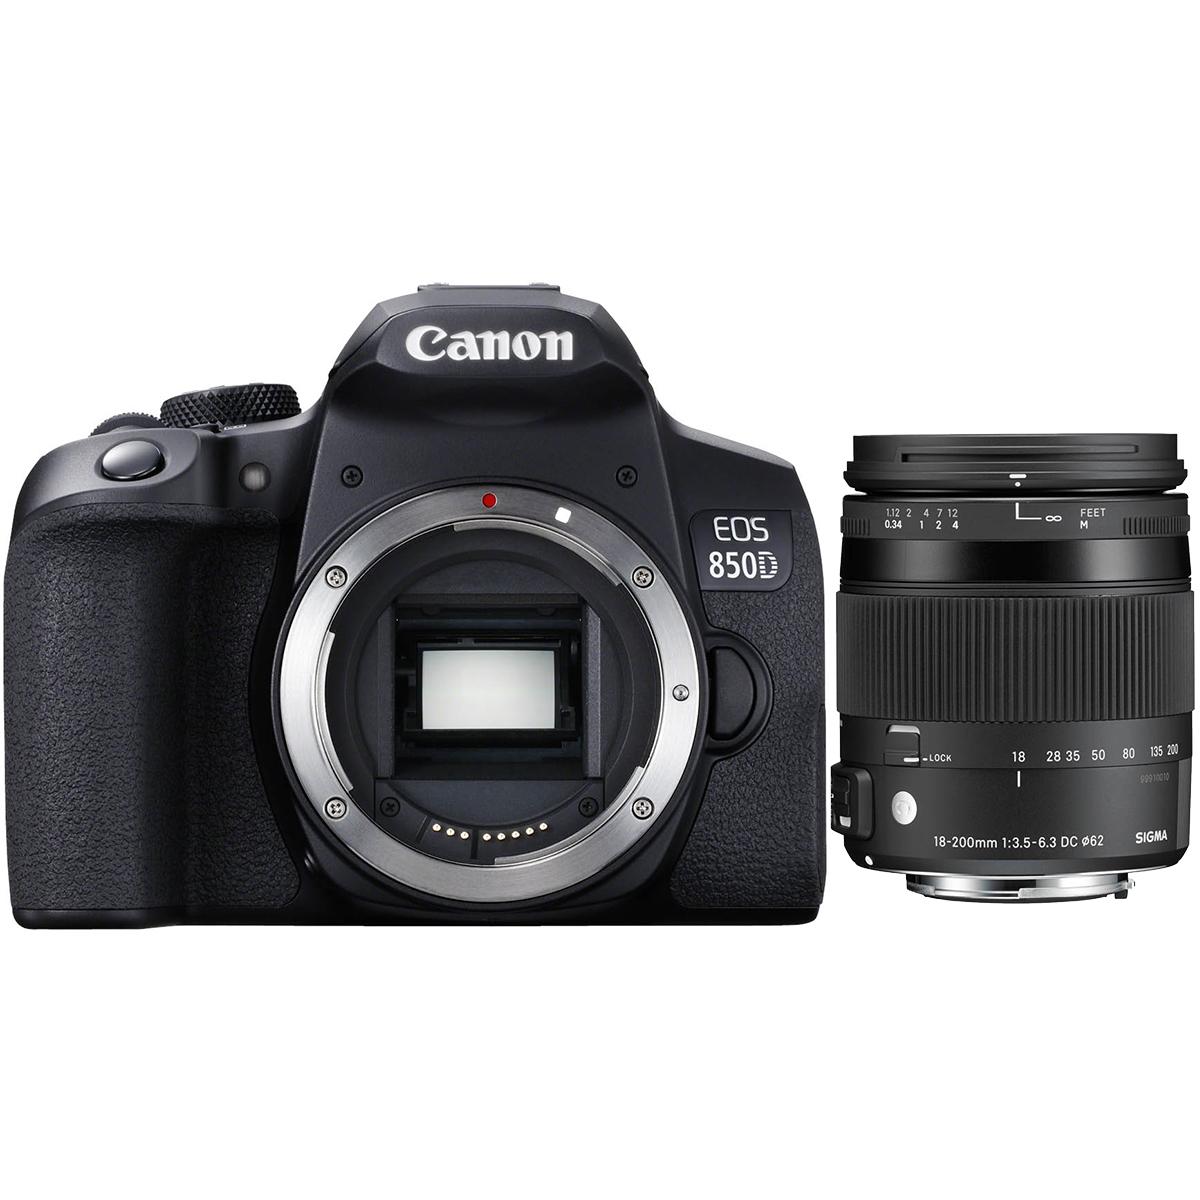 Canon EOS 850D + Sigma 18-200mm 3,5-6,3 DC Makro OS HSM C